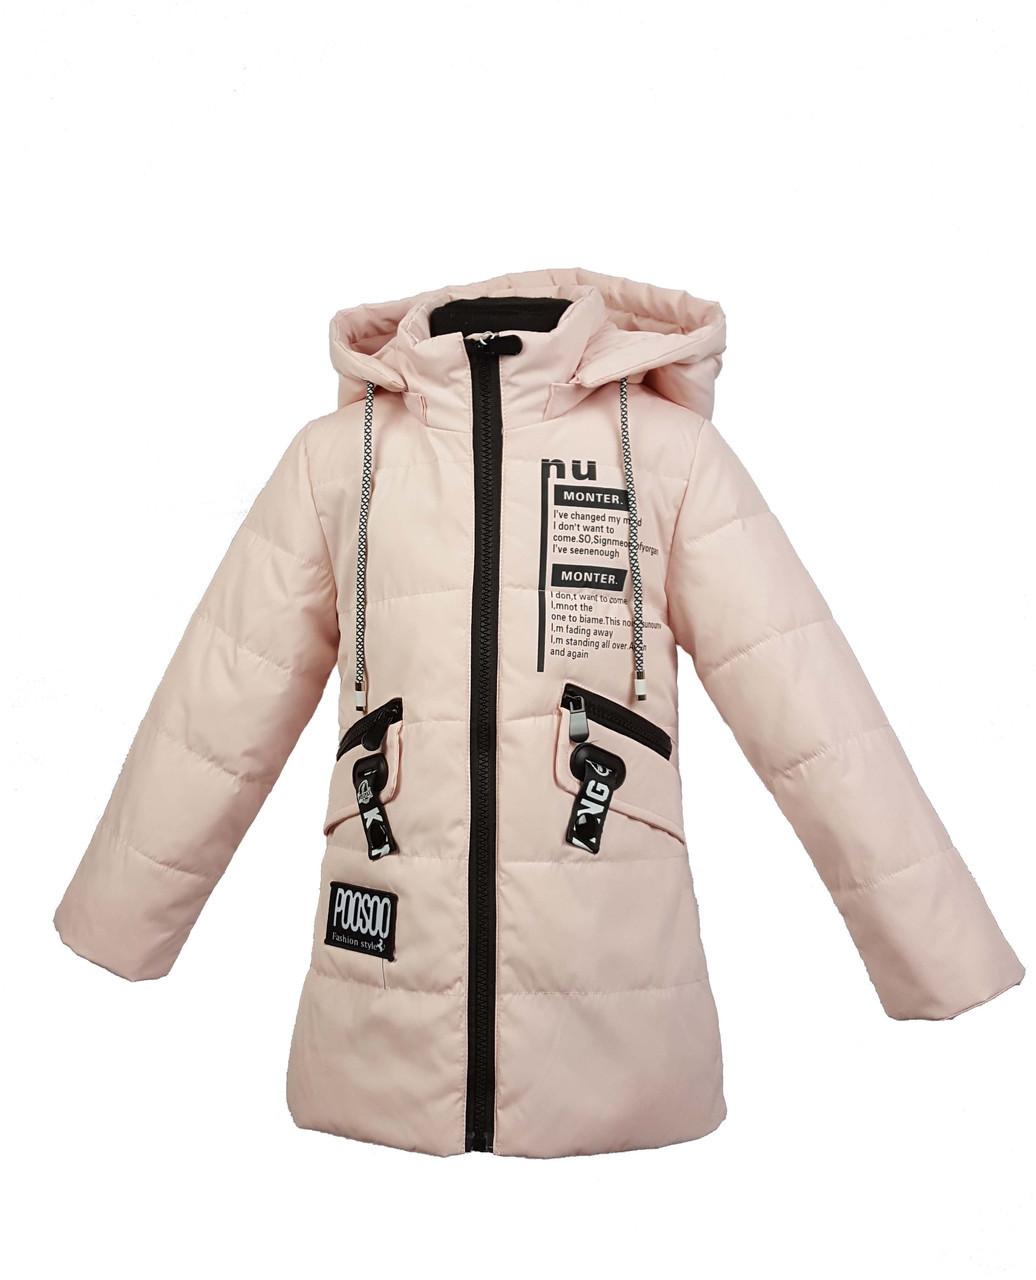 Куртка для девочки  1803B весна-осень, размеры на рост от 92 до 116 возраст от 1 до 5 лет